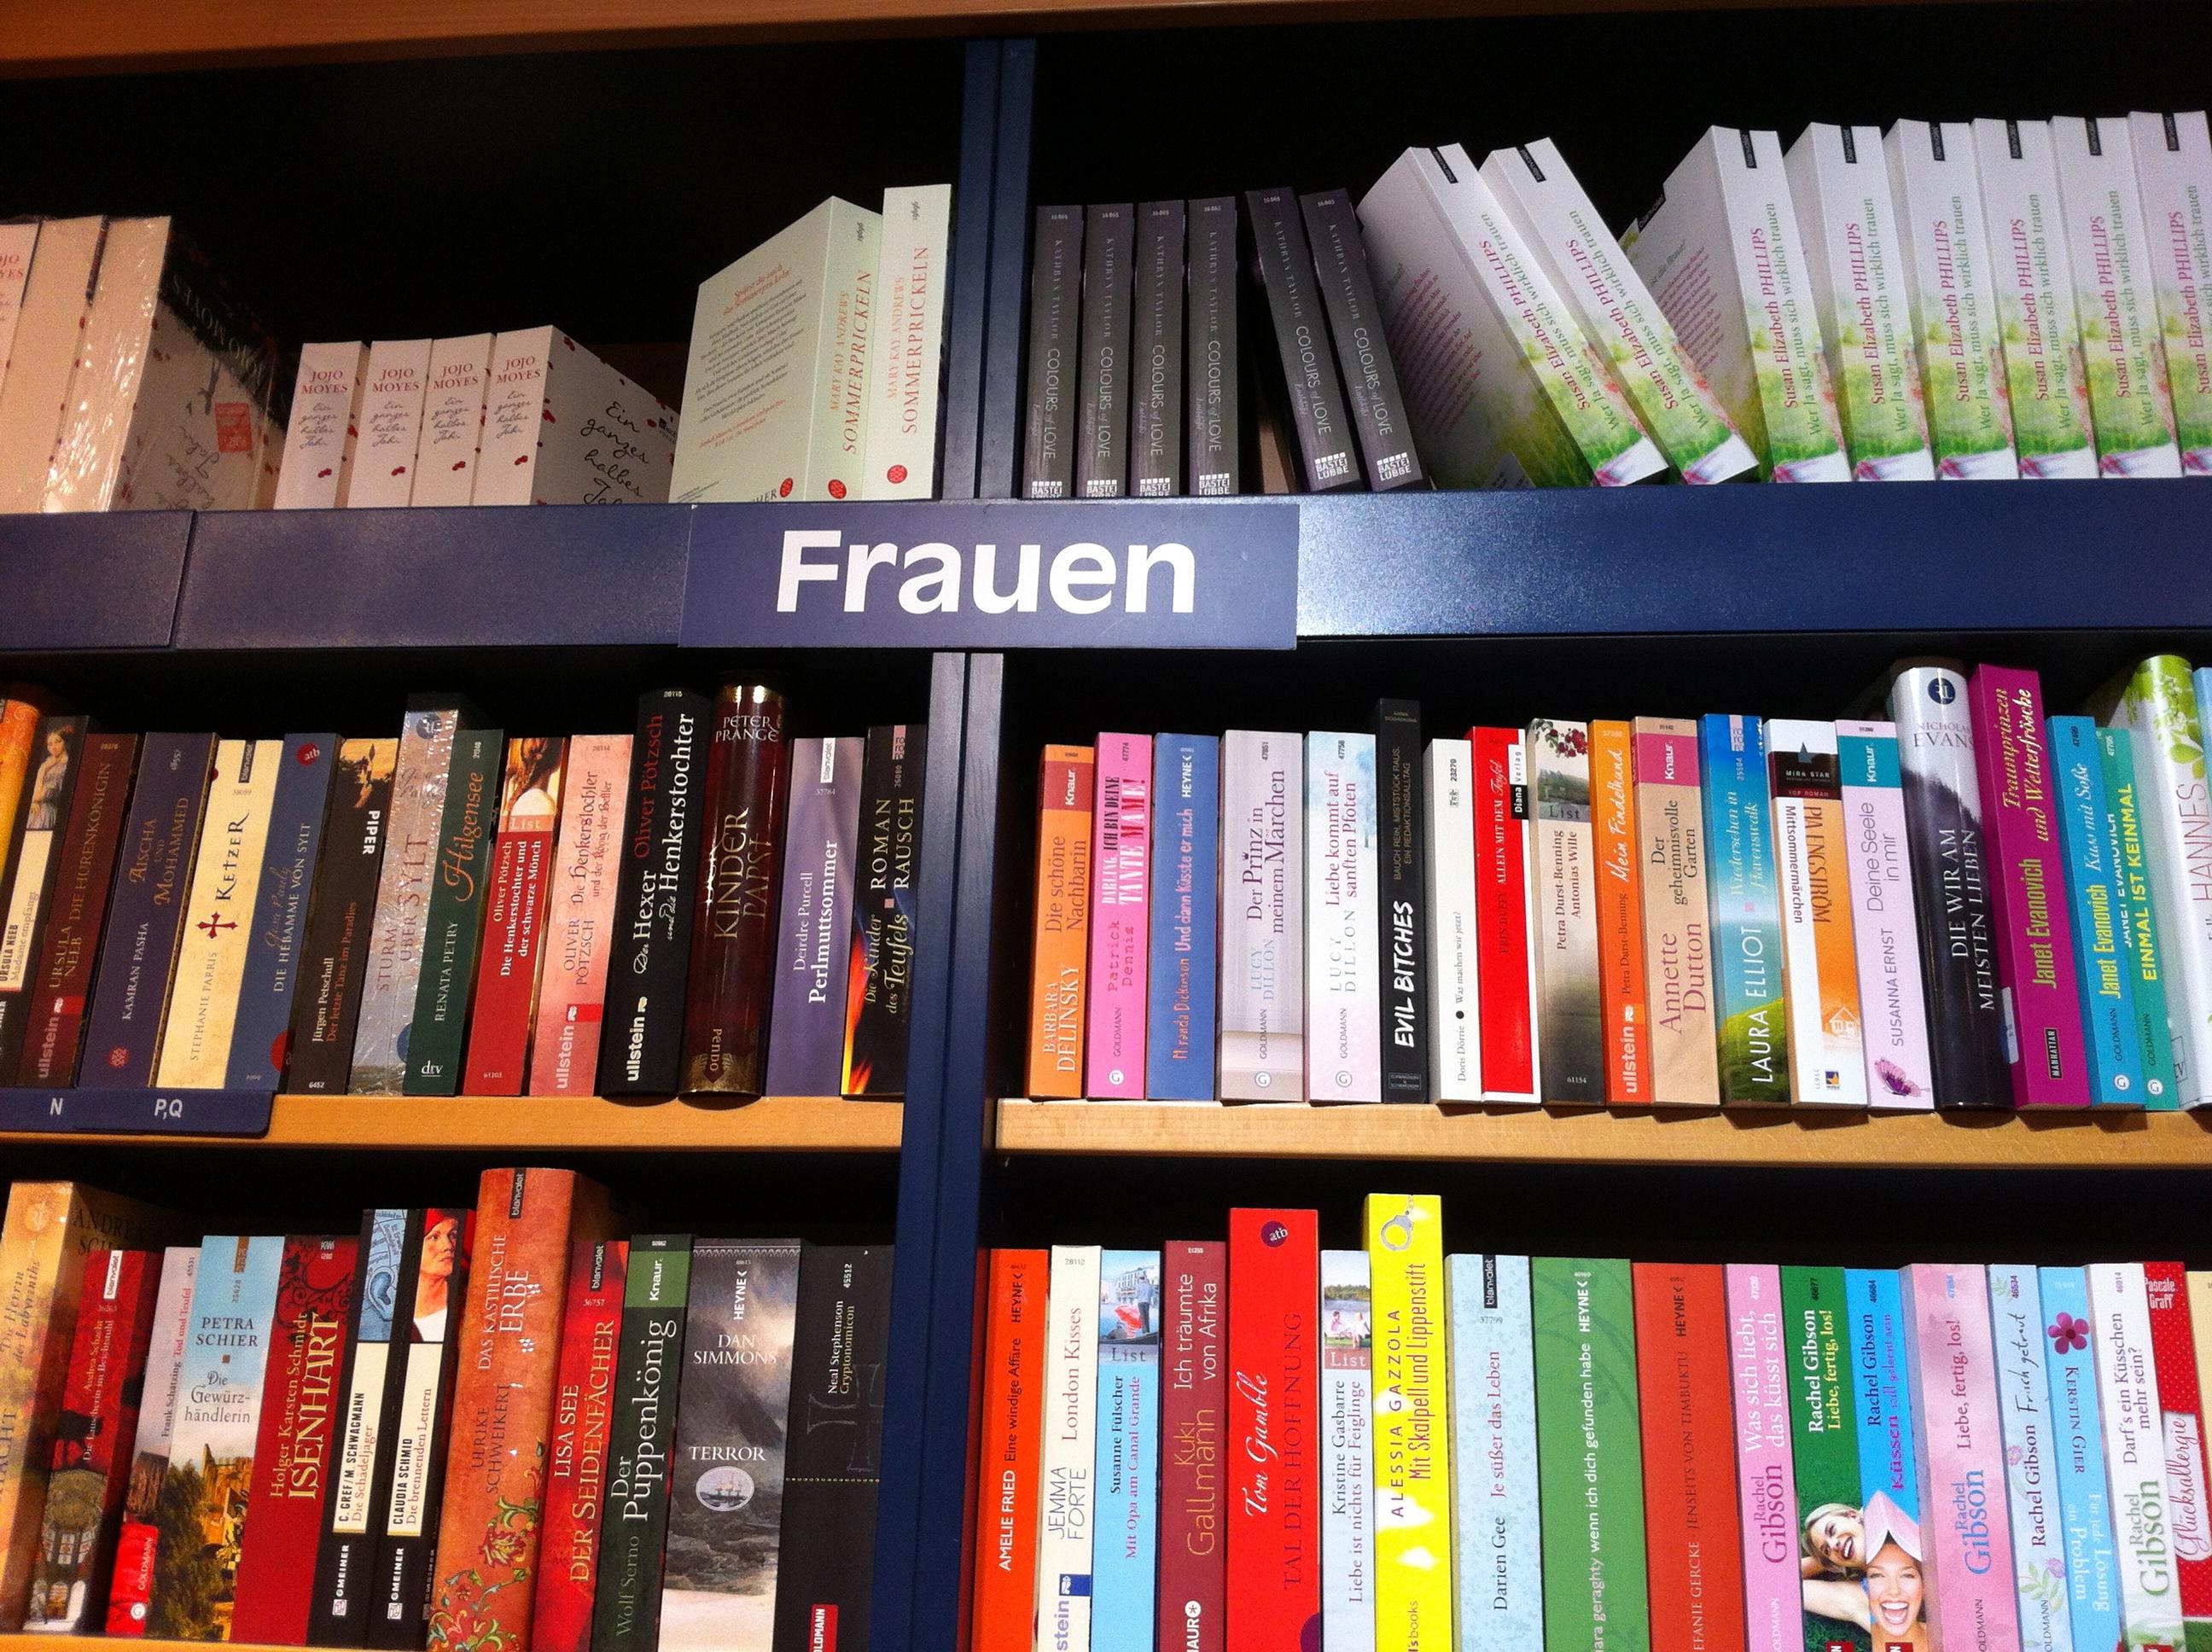 Frauen(literatur)